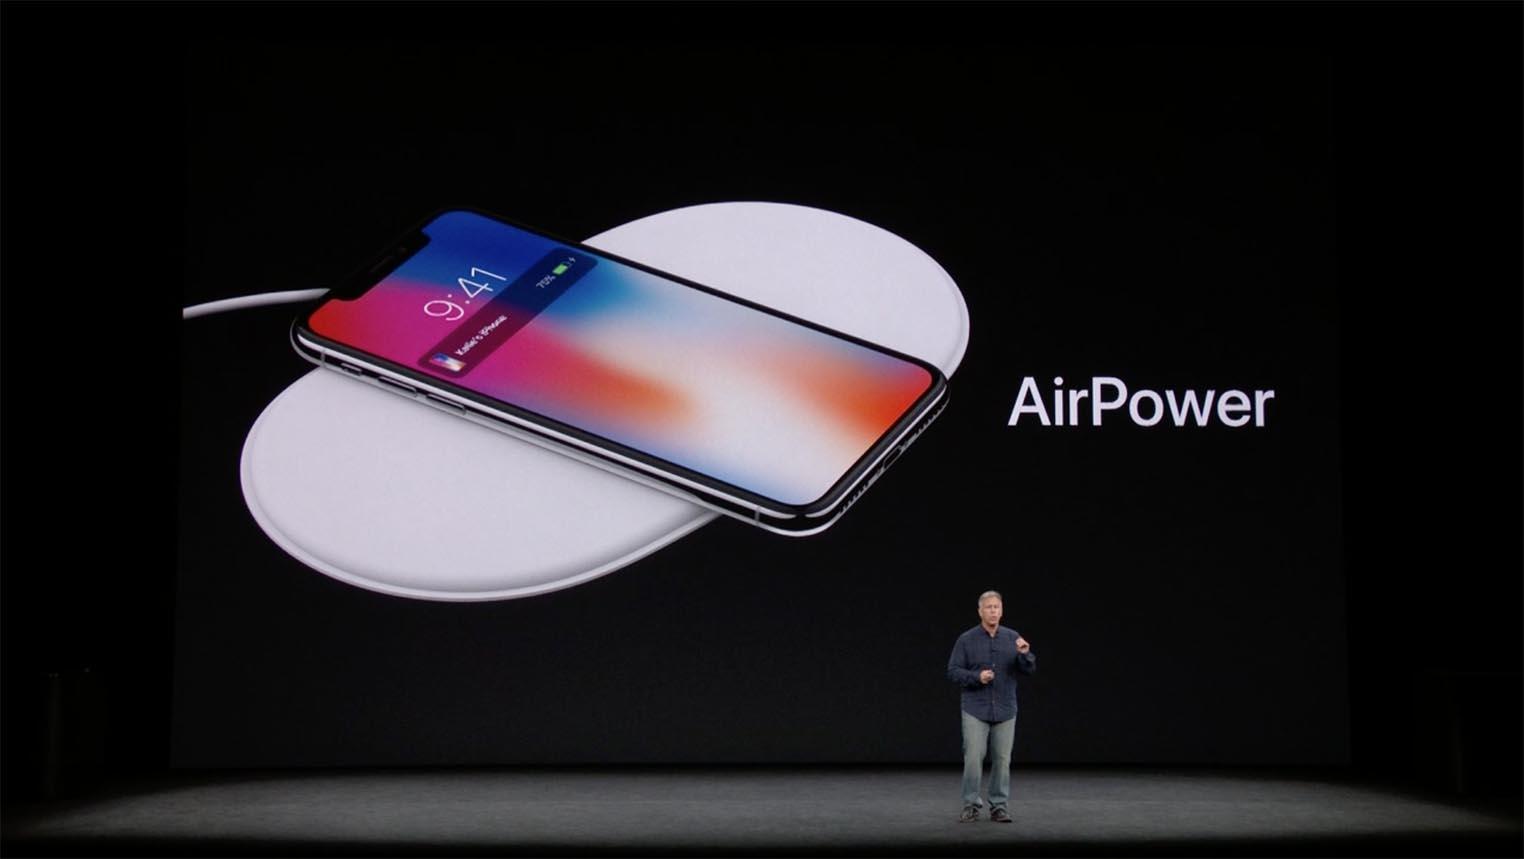 AirPower keynote